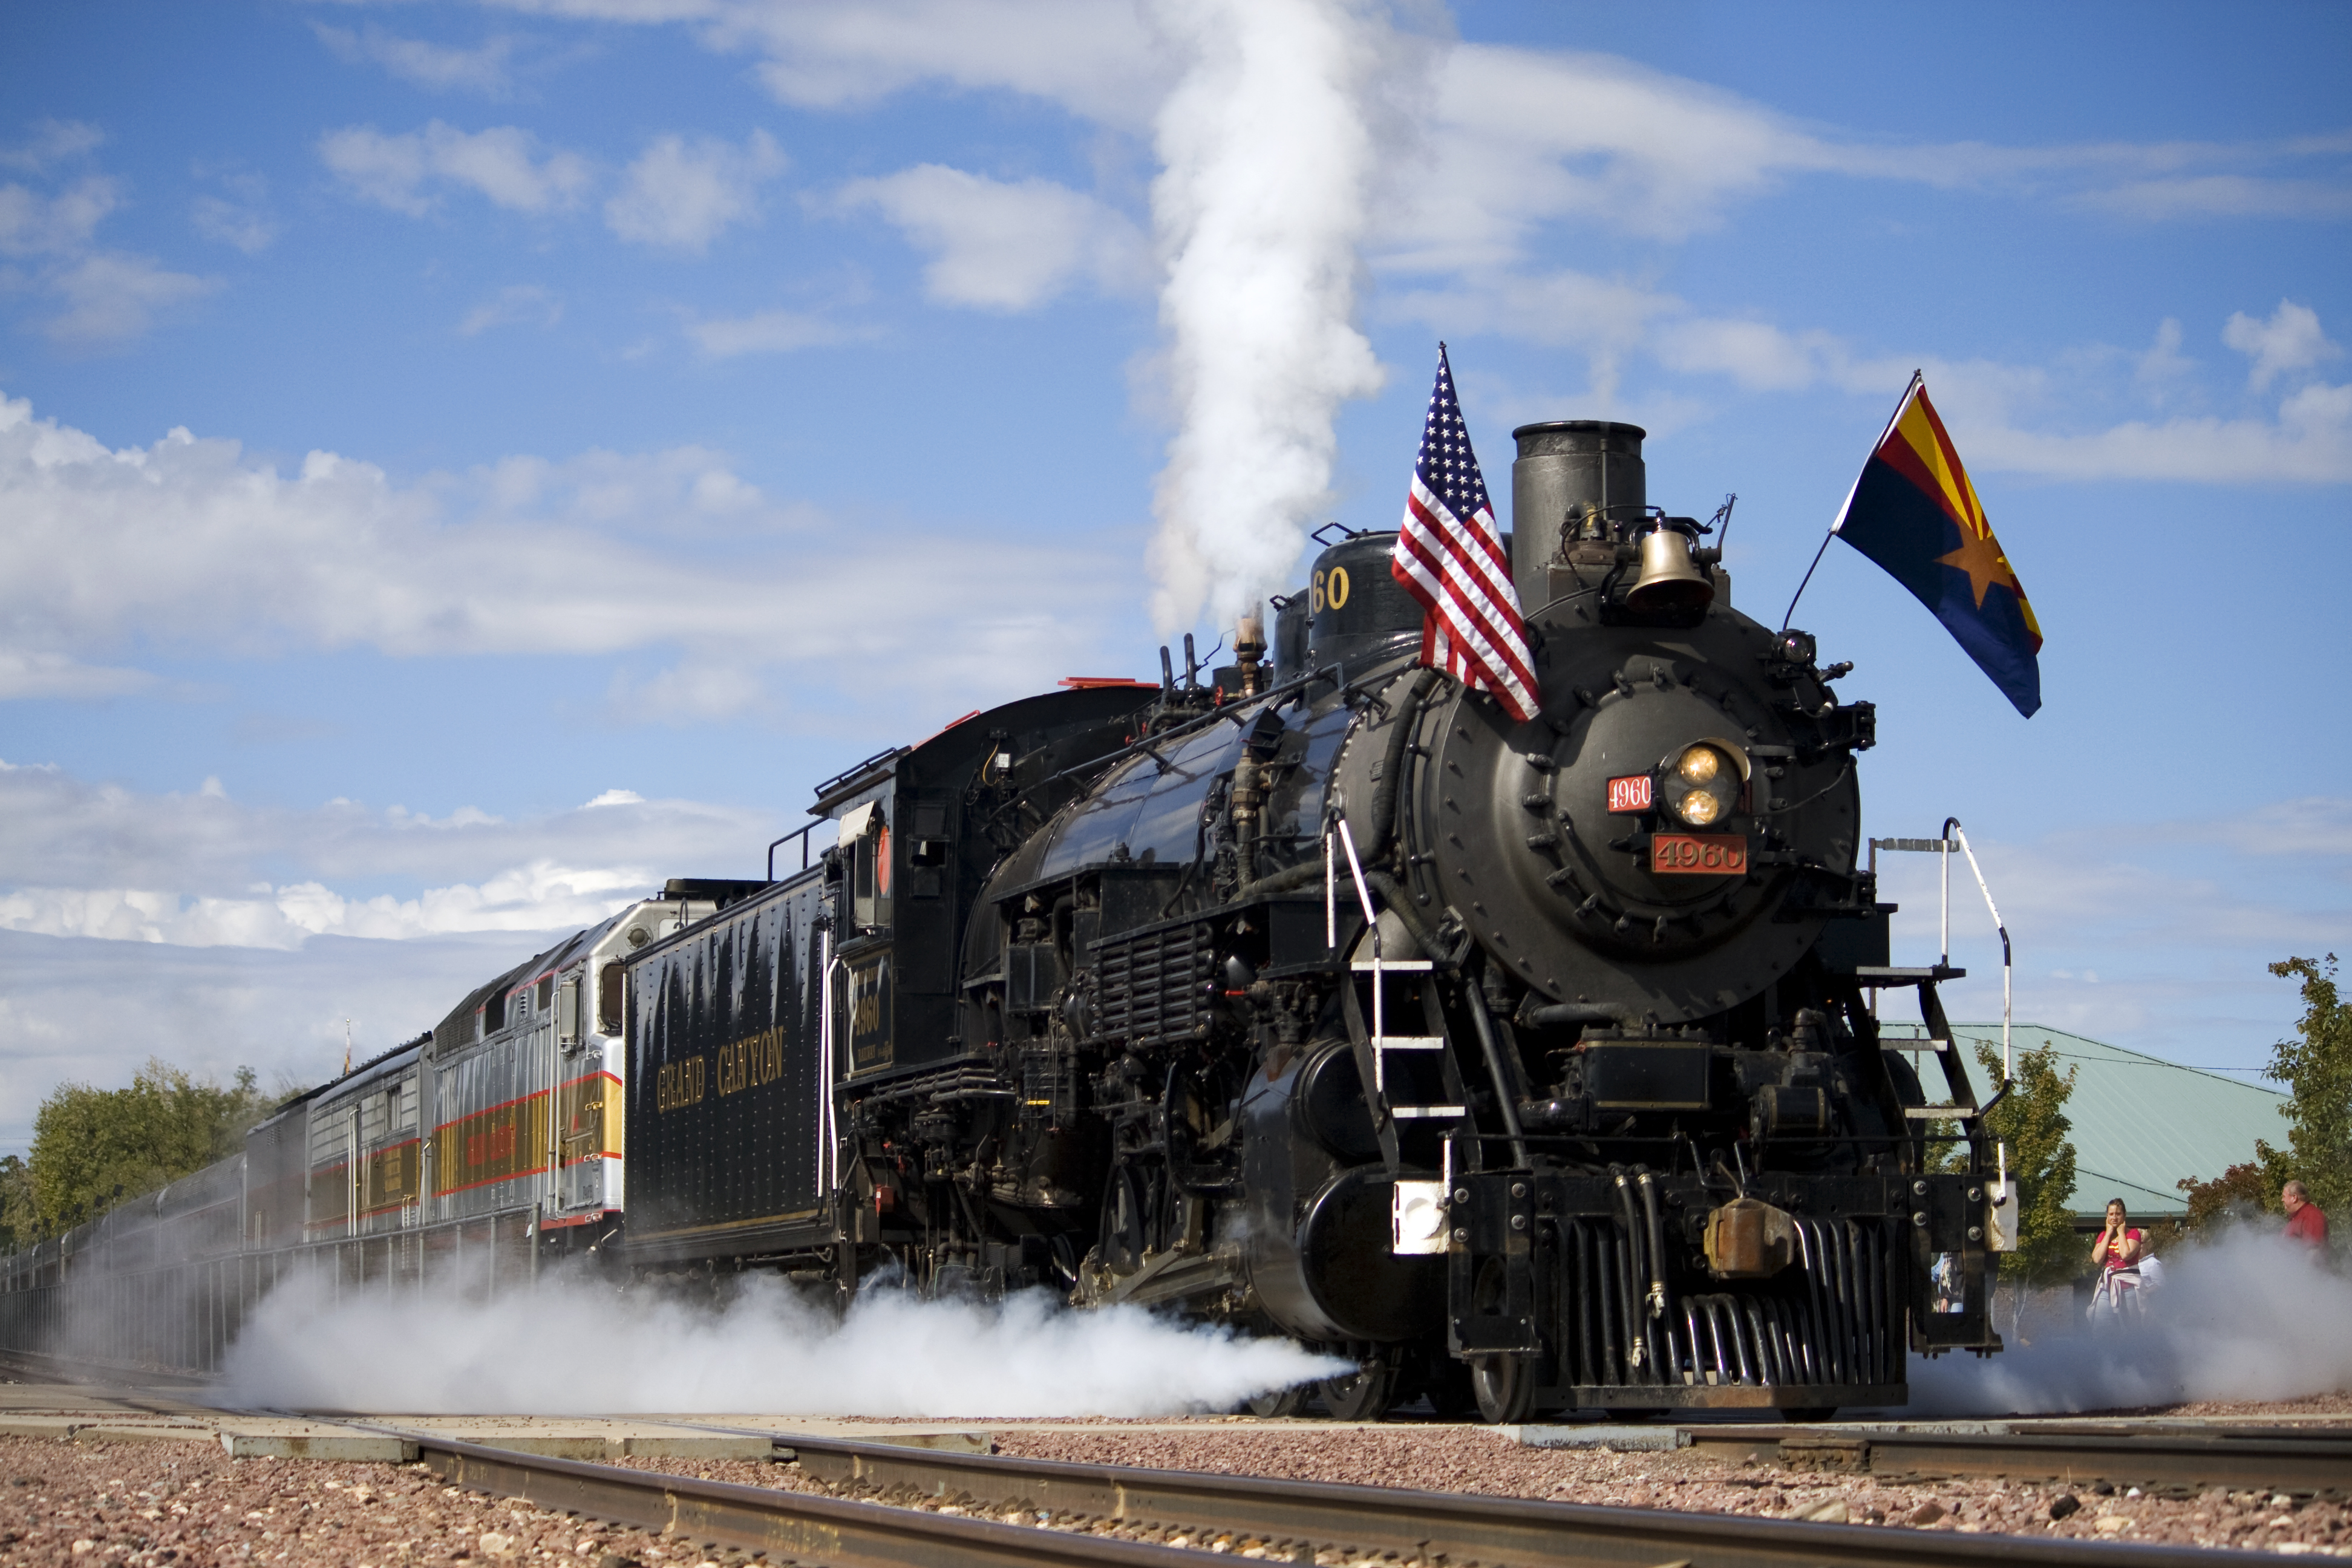 Arizona Steam Train Tours